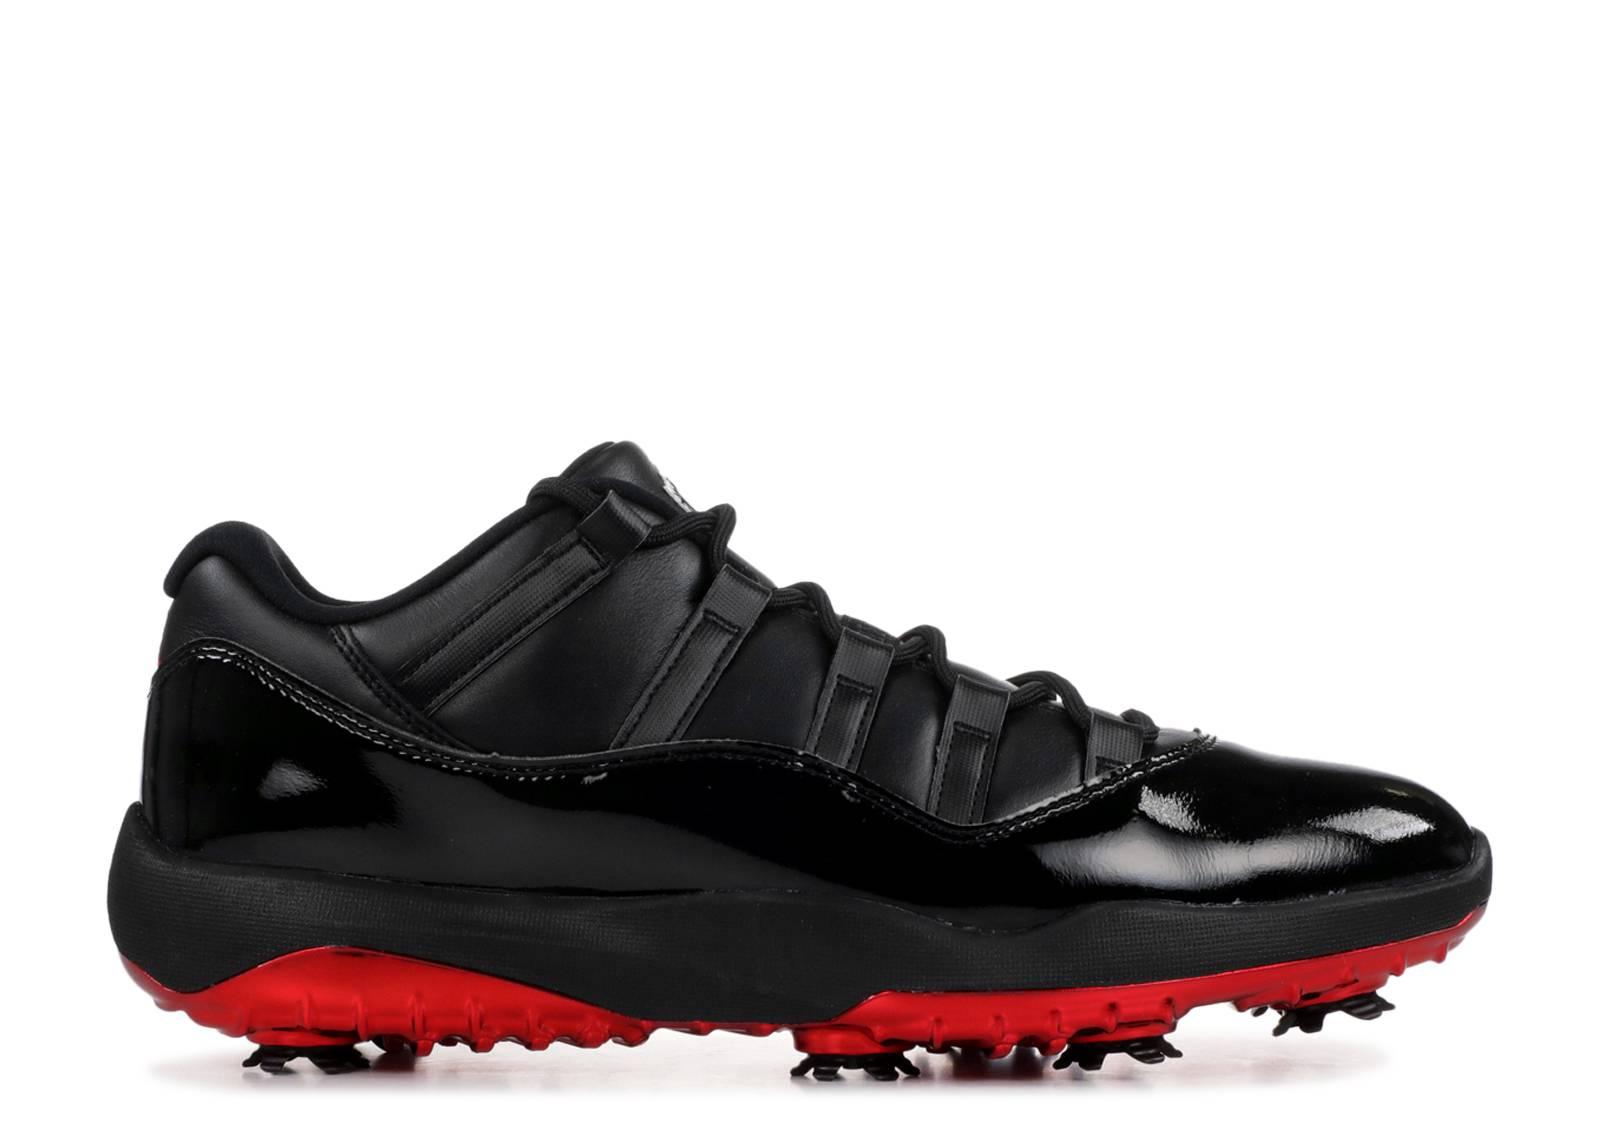 competitive price 62a0d 44122 Air Jordan 11 Golf 'Safari Bred'